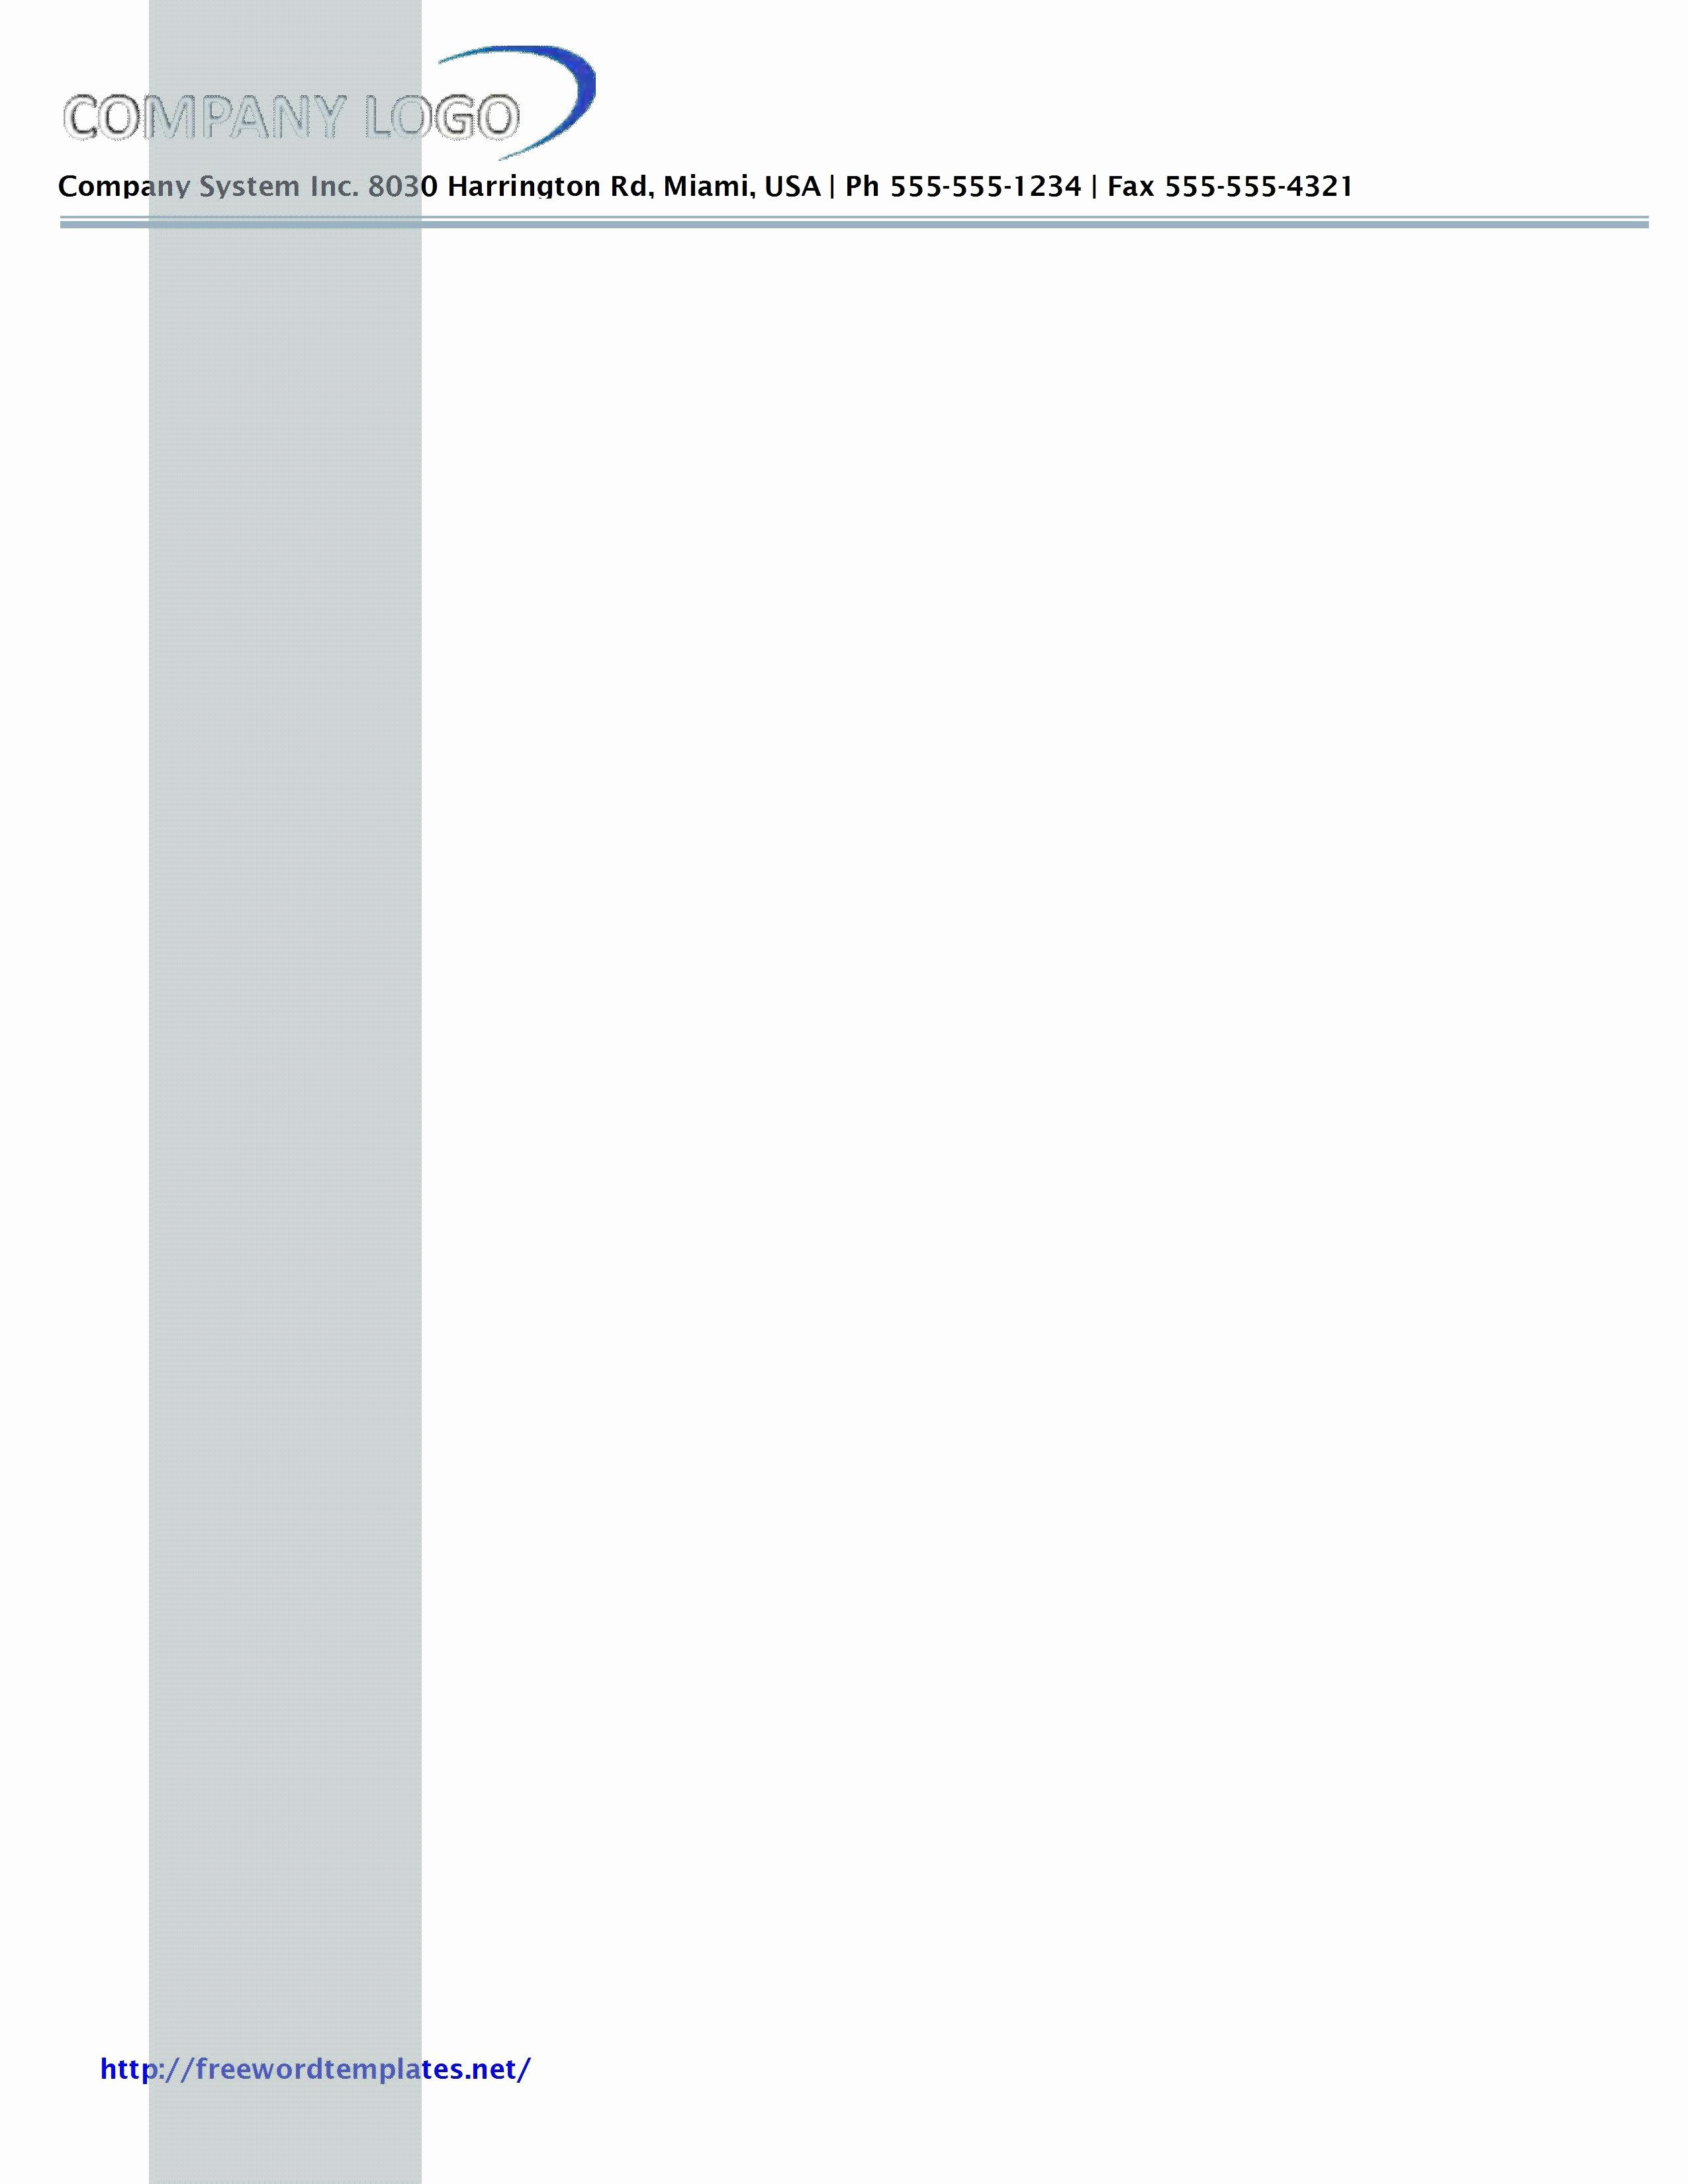 Best Letterhead Stationery Free Printable Letterhead Templates - Free Printable Letterhead Templates